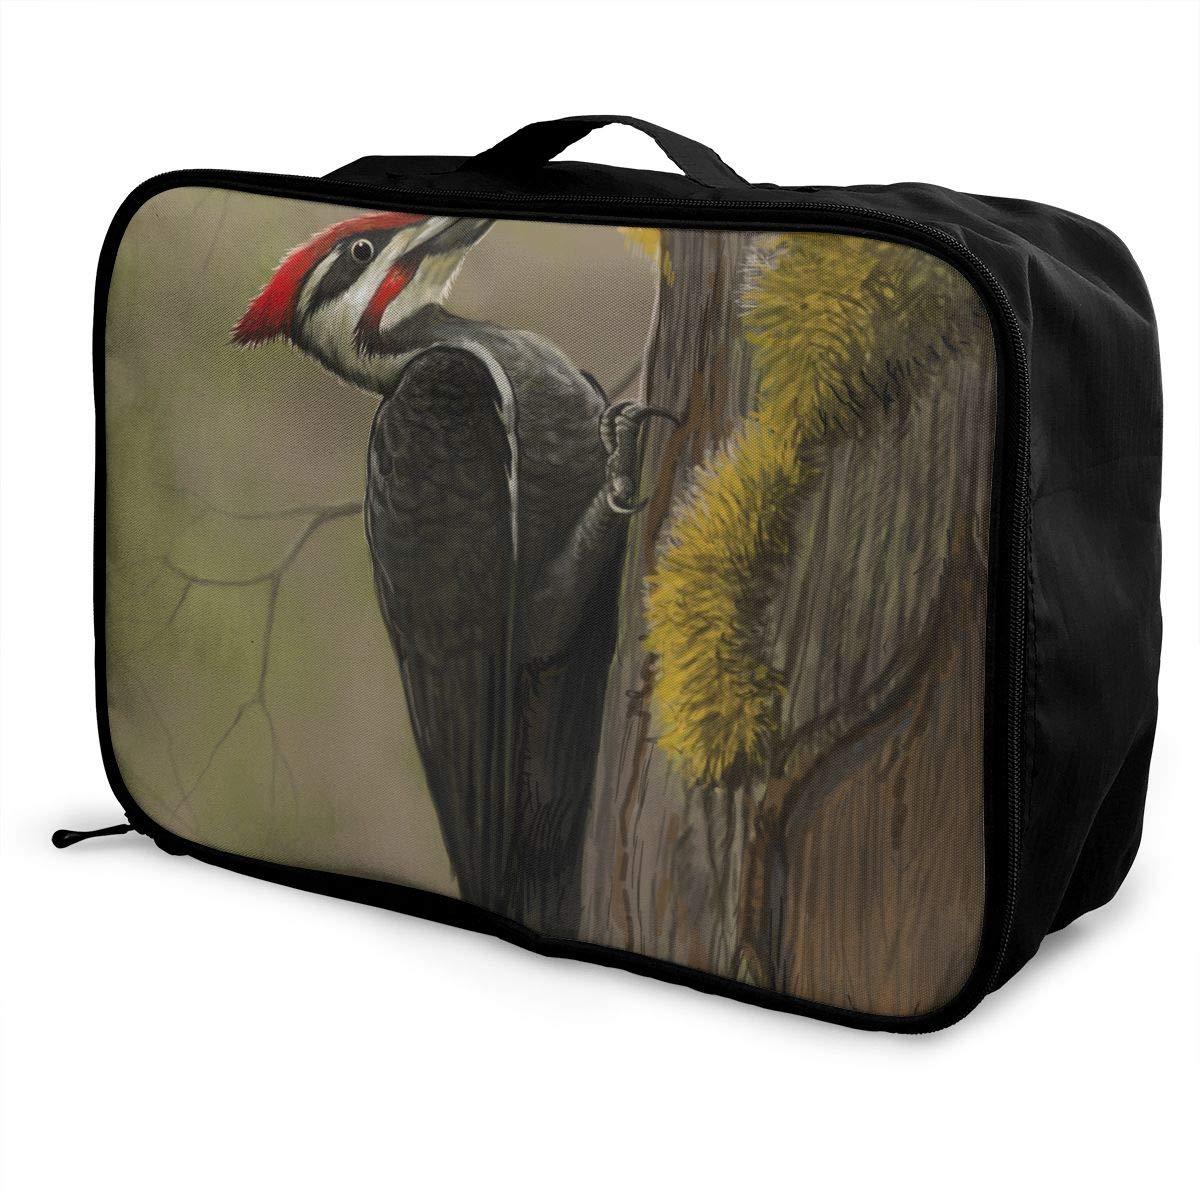 Travel Luggage Duffle Bag Lightweight Portable Handbag Woodpecker Beetle Large Capacity Waterproof Foldable Storage Tote